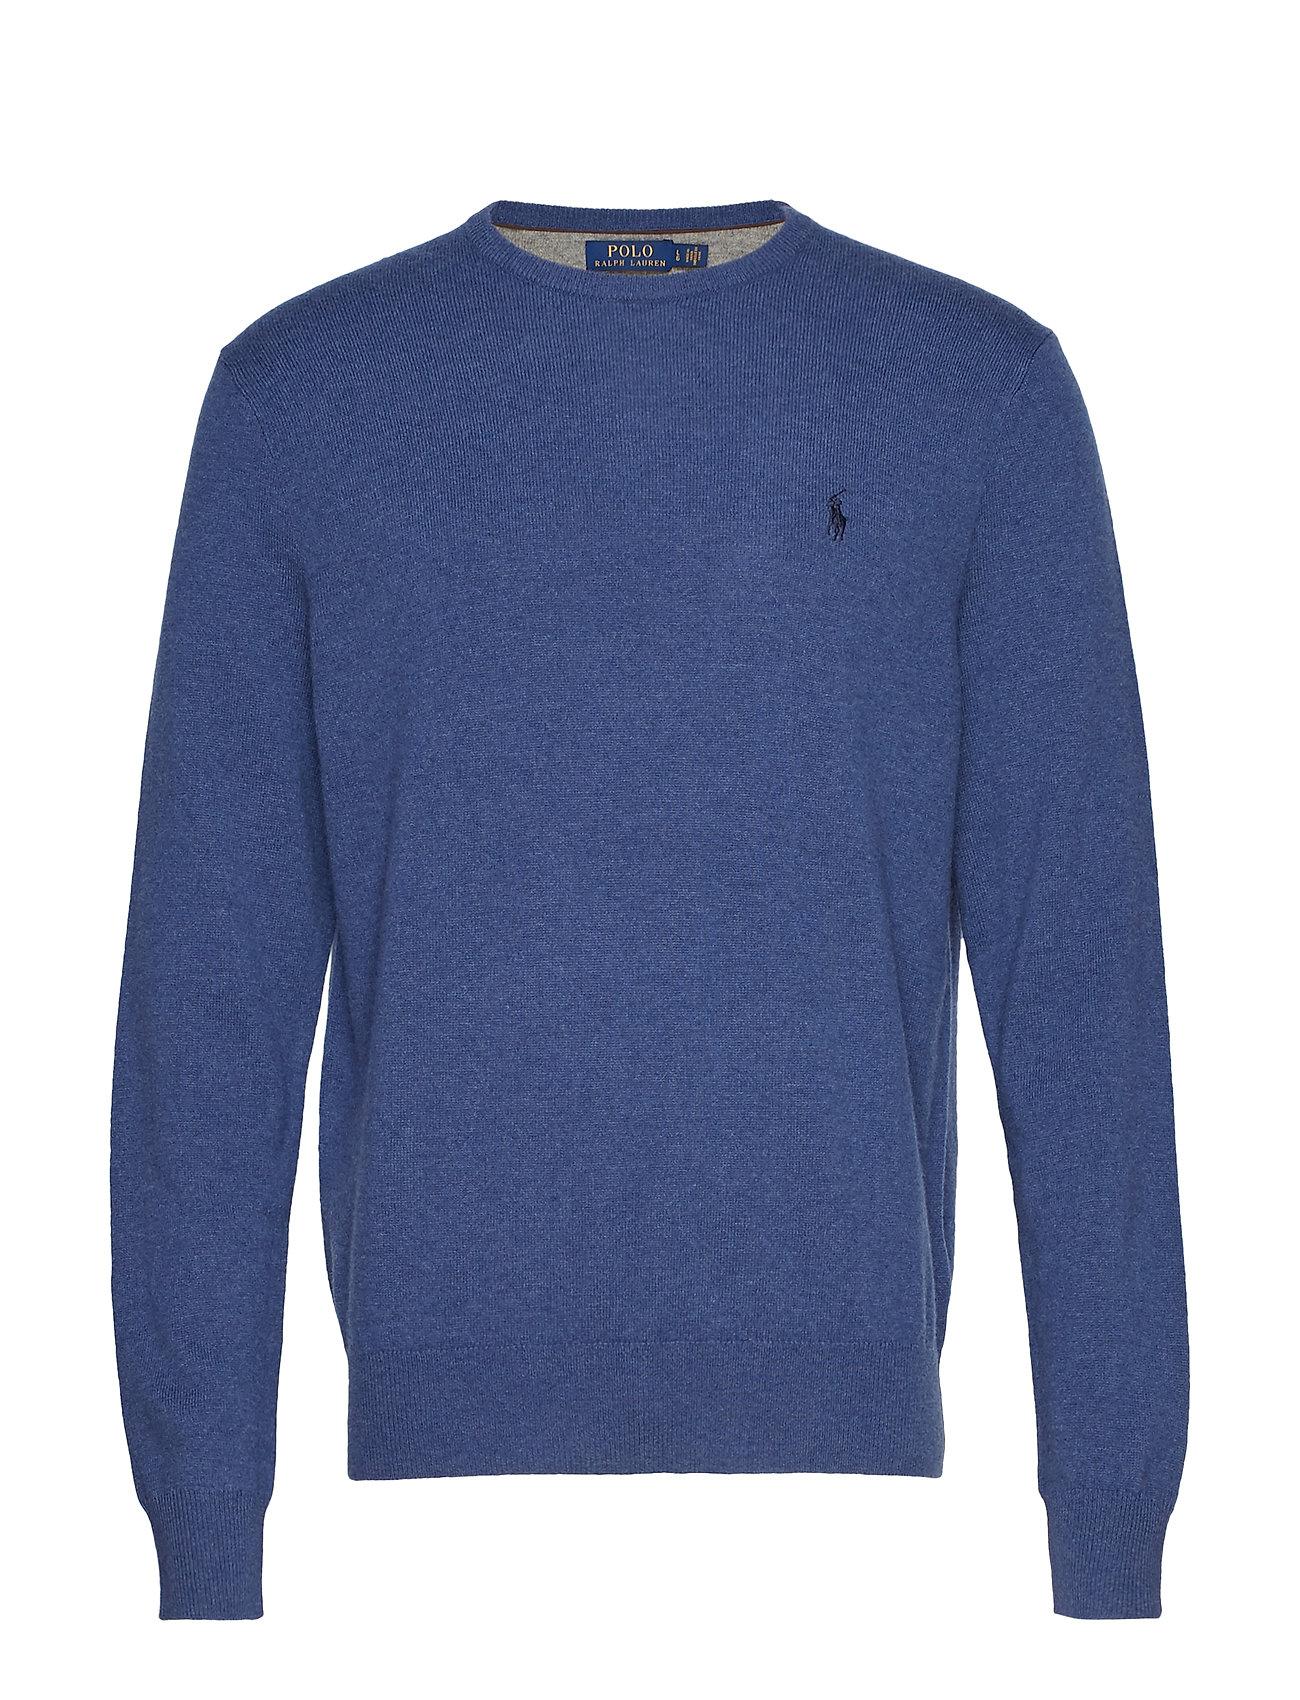 Polo Ralph Lauren Merino Wool Crewneck Sweater - SHALE BLUE HEATHE